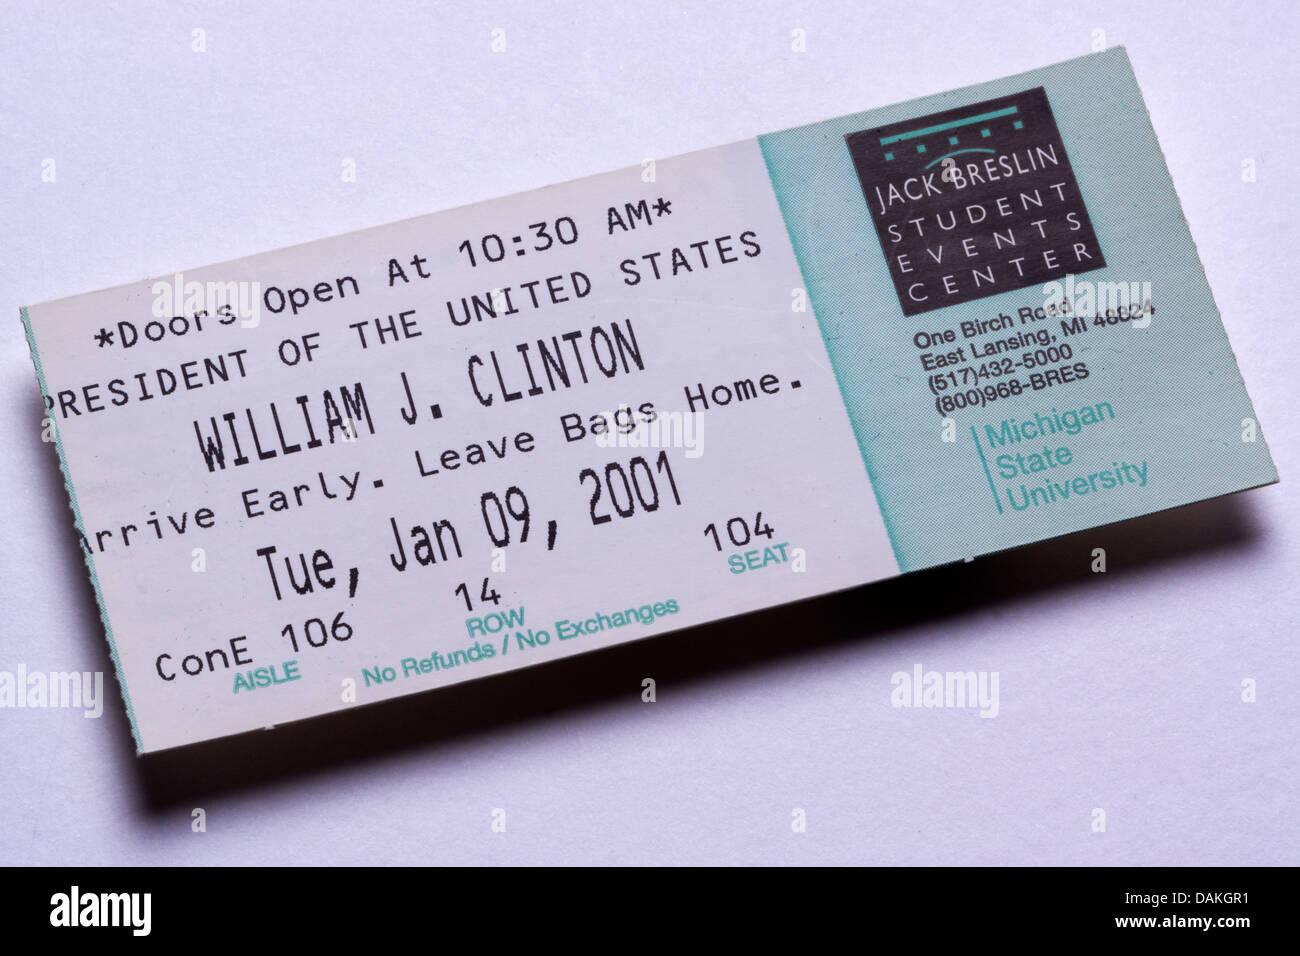 Ticket stub to a Bill Clinton speech at Michigan State University, Jan 9, 2001 - Stock Image